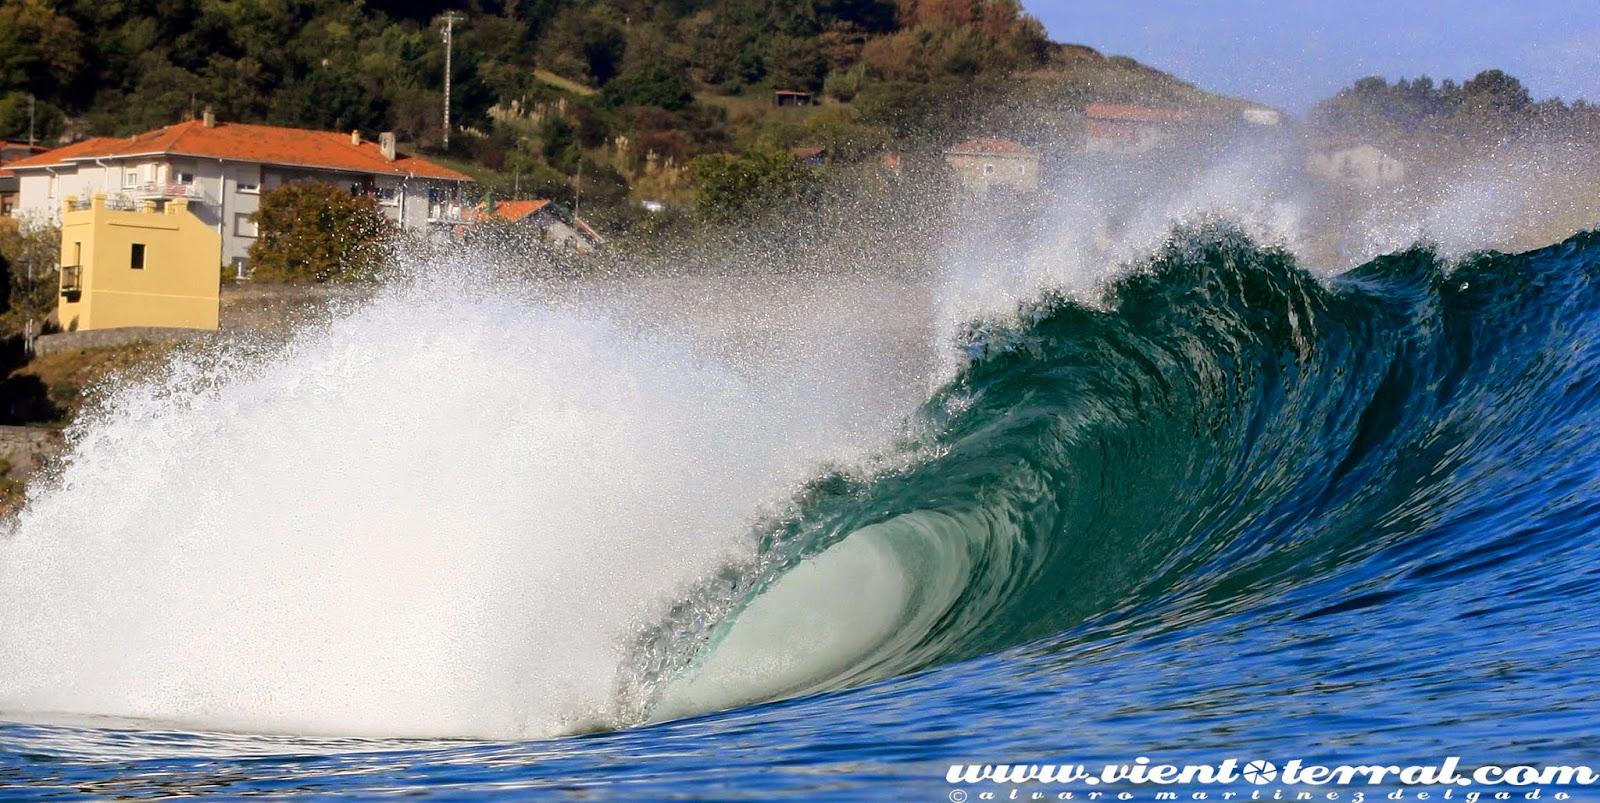 sesion mundaka octubre viento terral surf %2B(4)